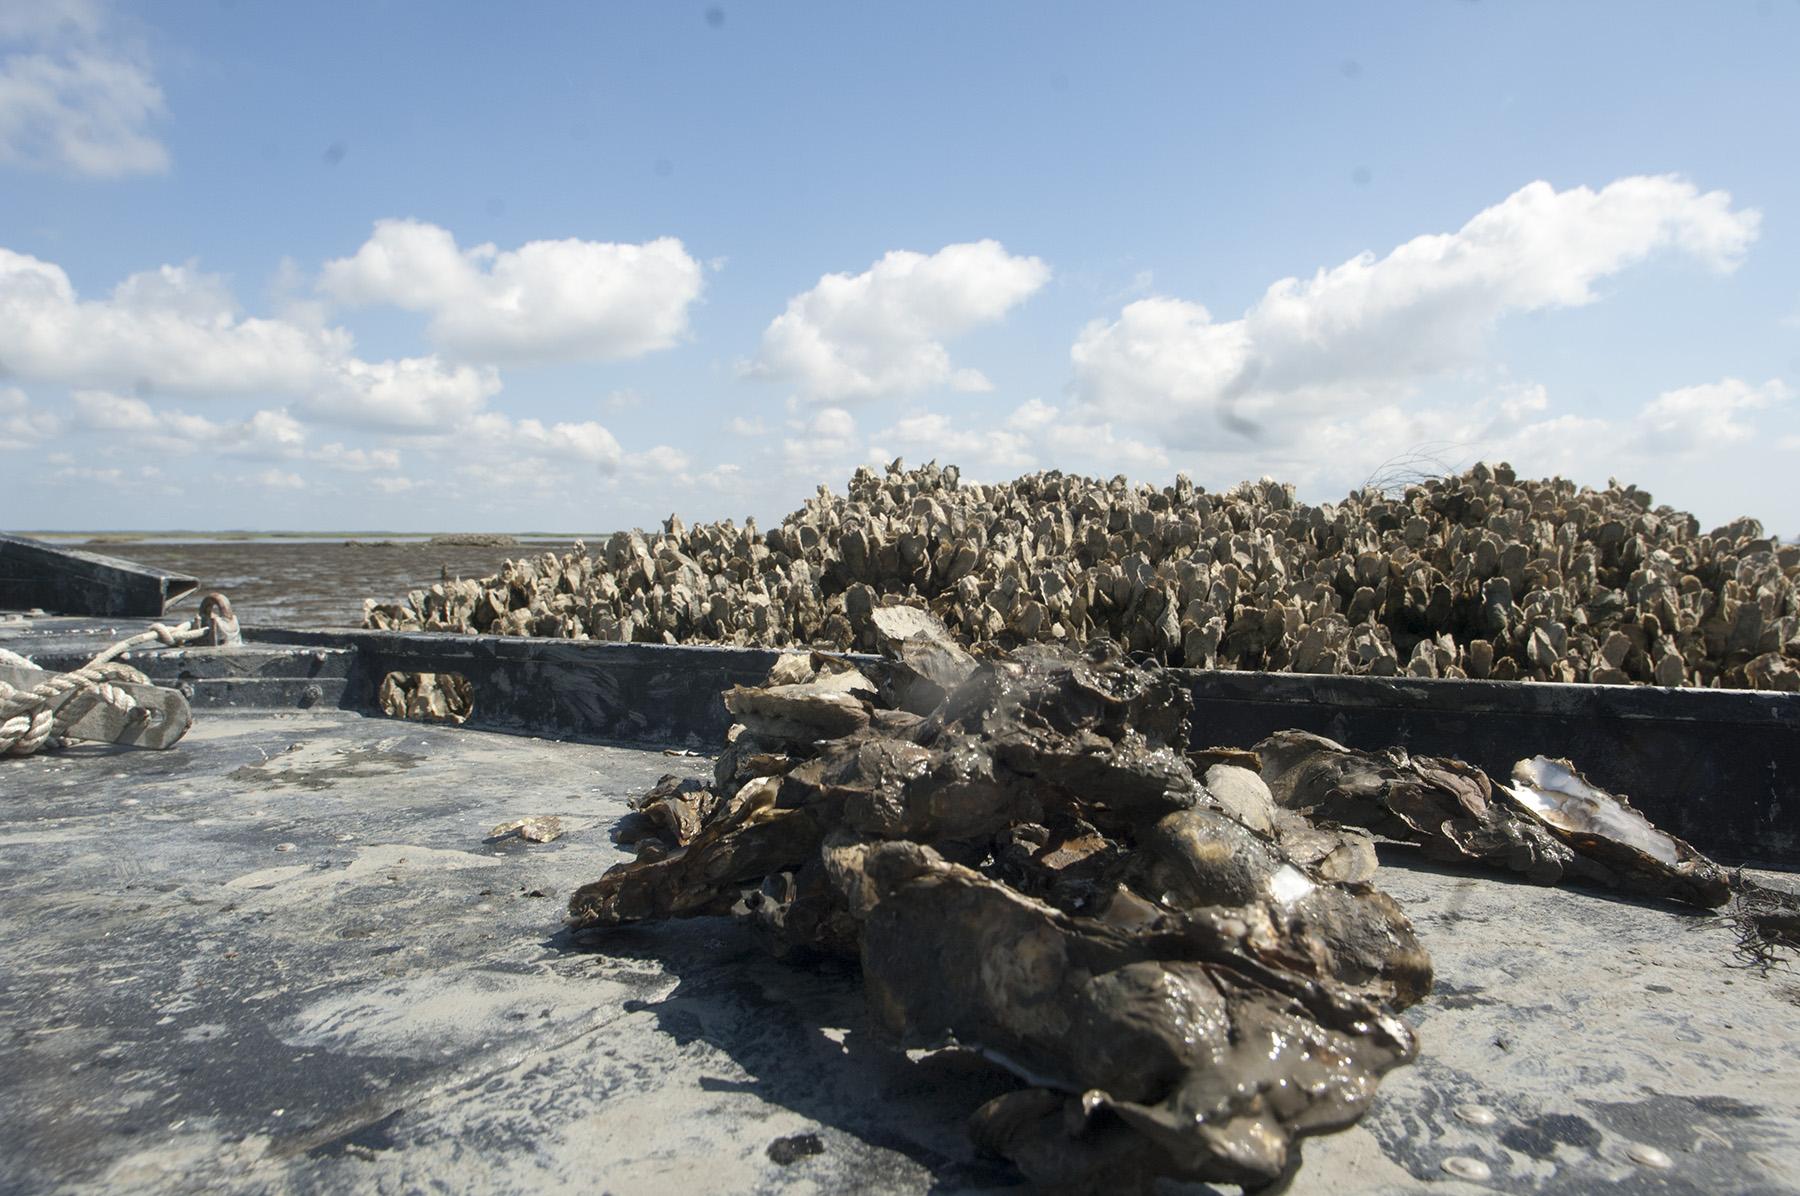 Wild Georgia Oysters